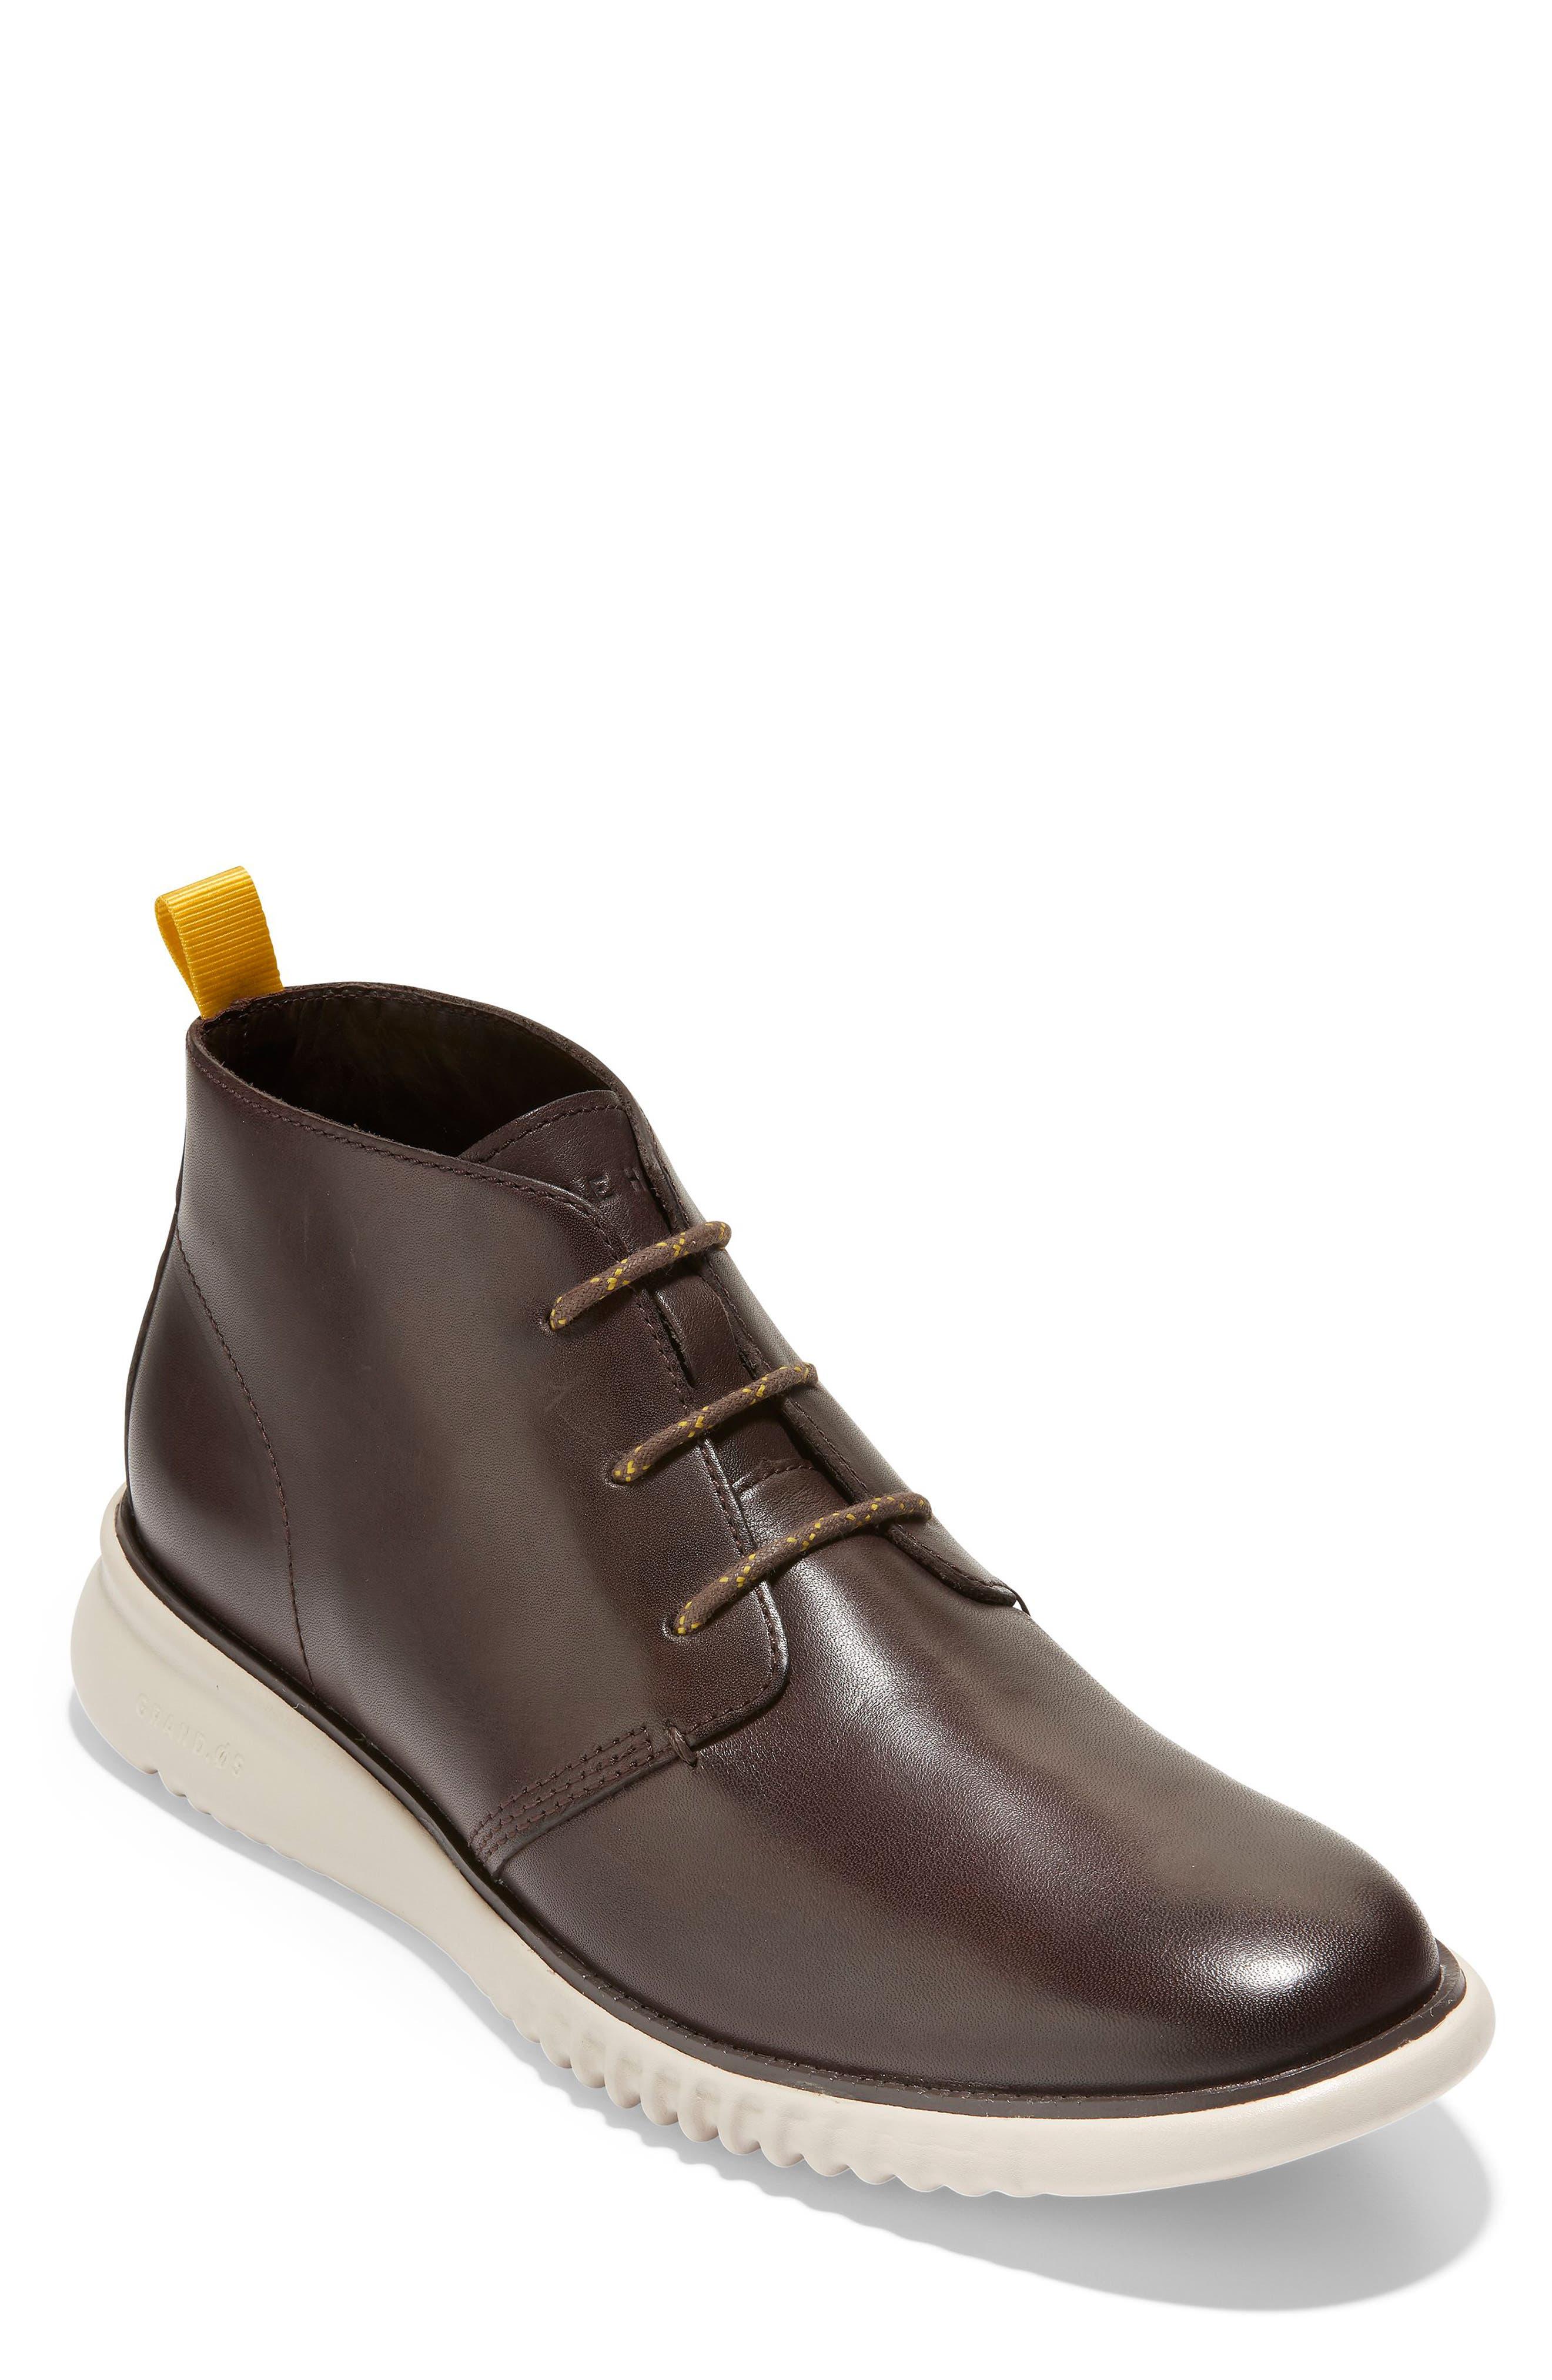 2.zerogrand Chukka Boot